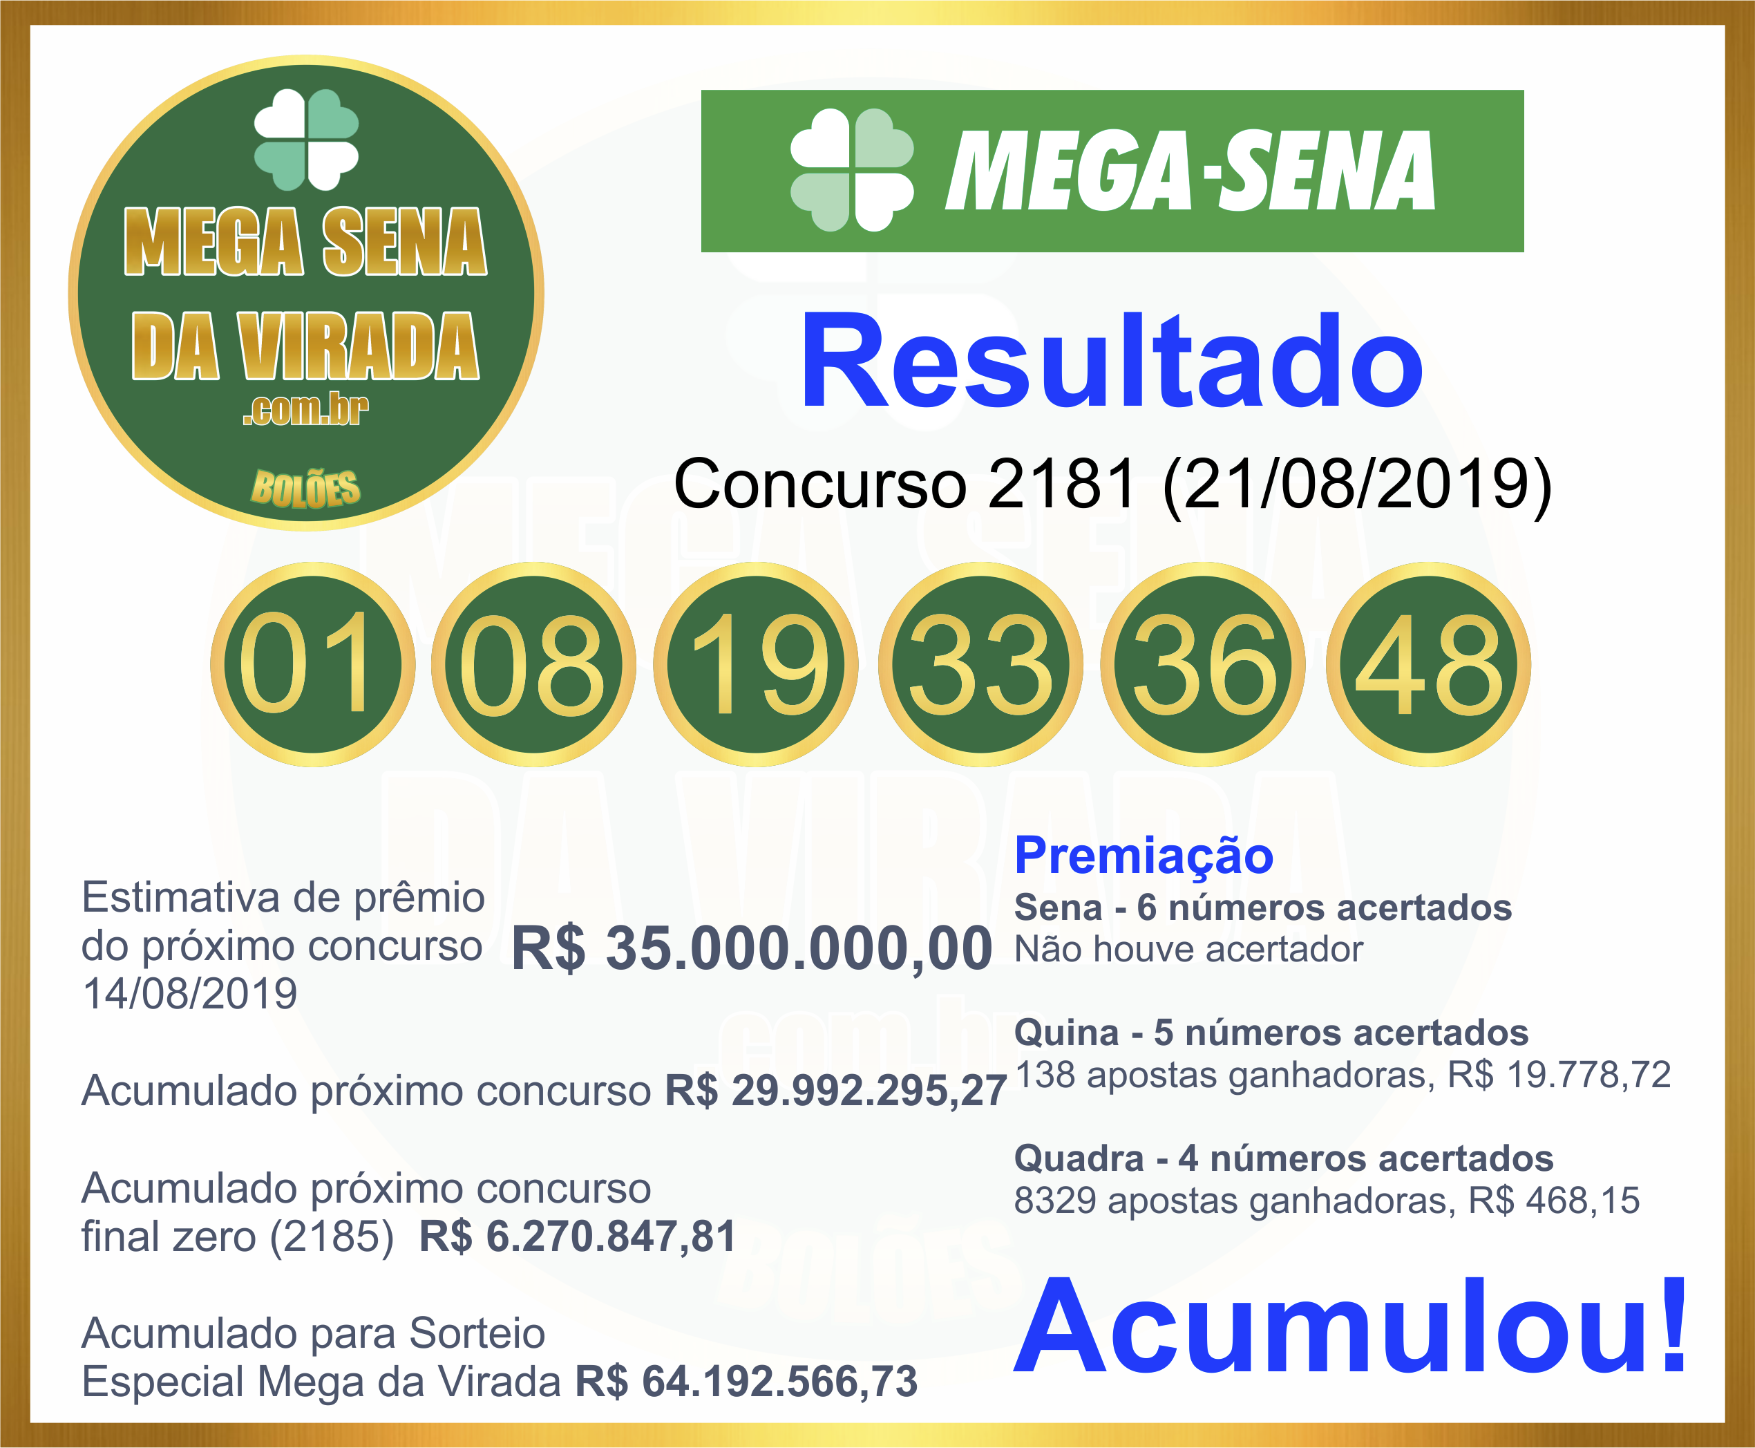 Mega Sena Concurso 2181 21/08/2019